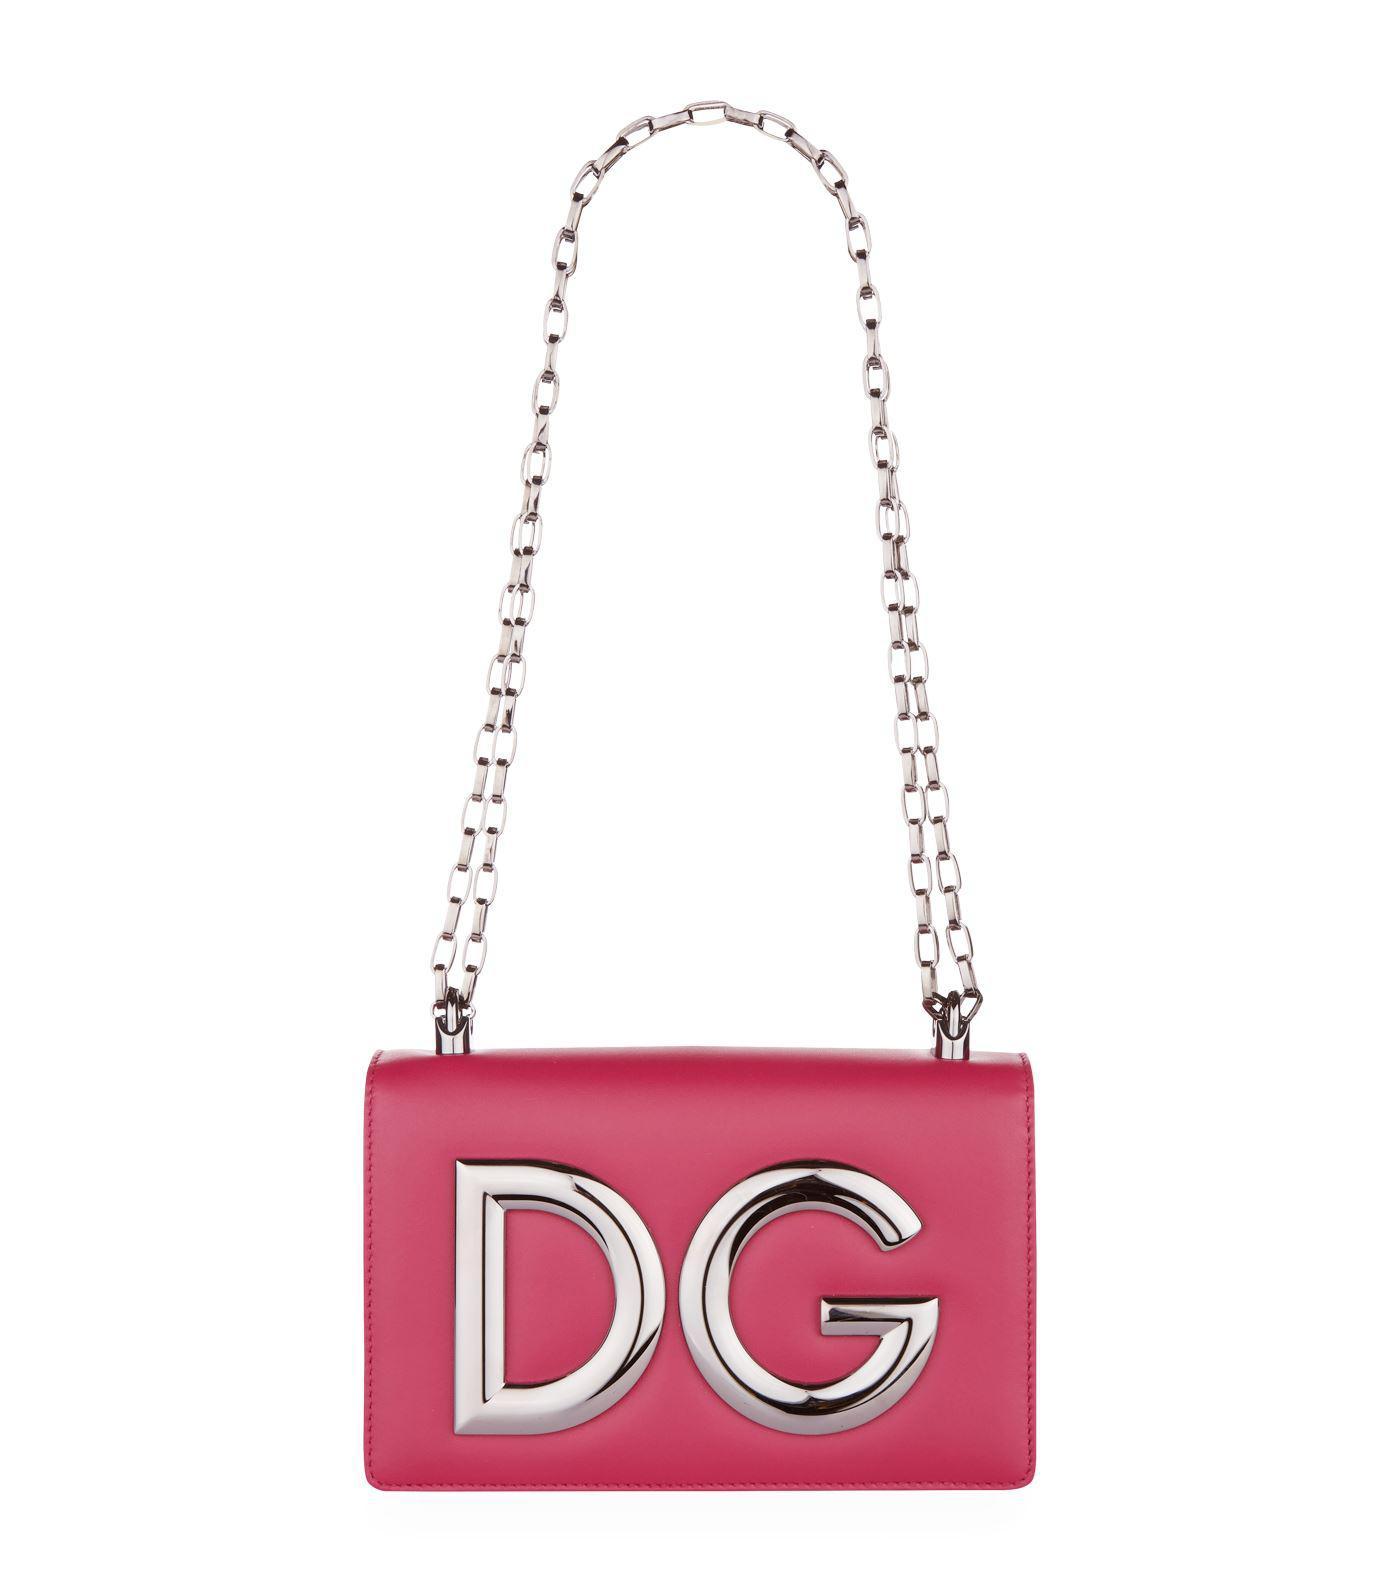 58a51981201e Dolce   Gabbana Logo Hardware Shoulder Bag - Lyst